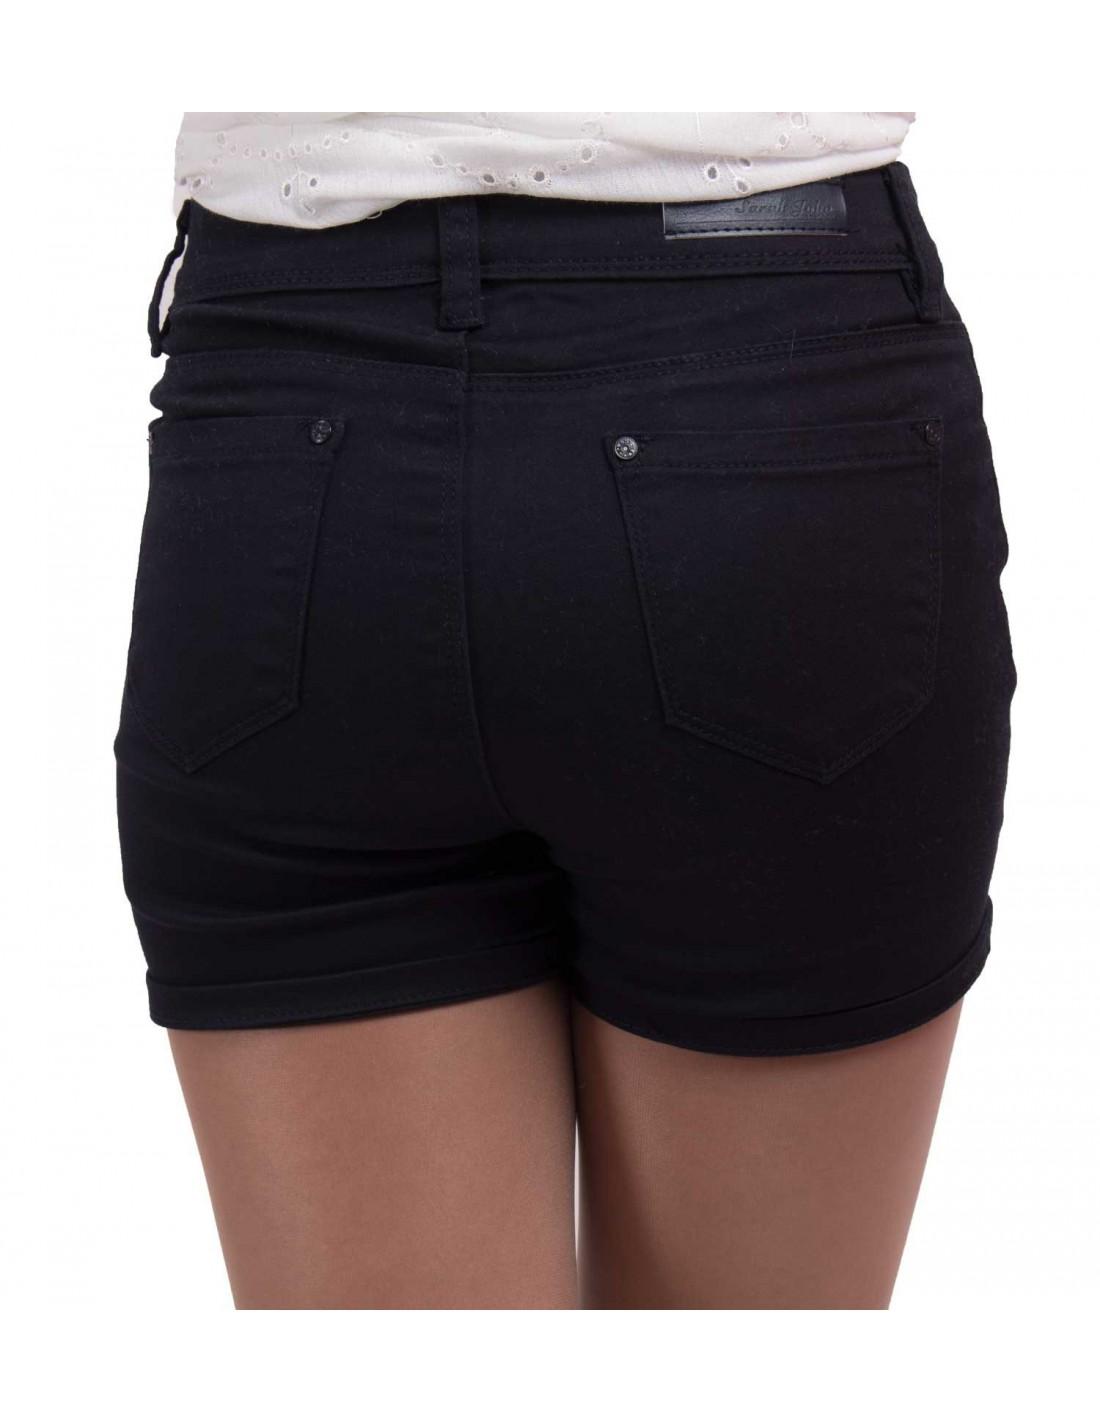 581d355c46 Short en jean femme taille haute & stretch bleu marine, beige,noir